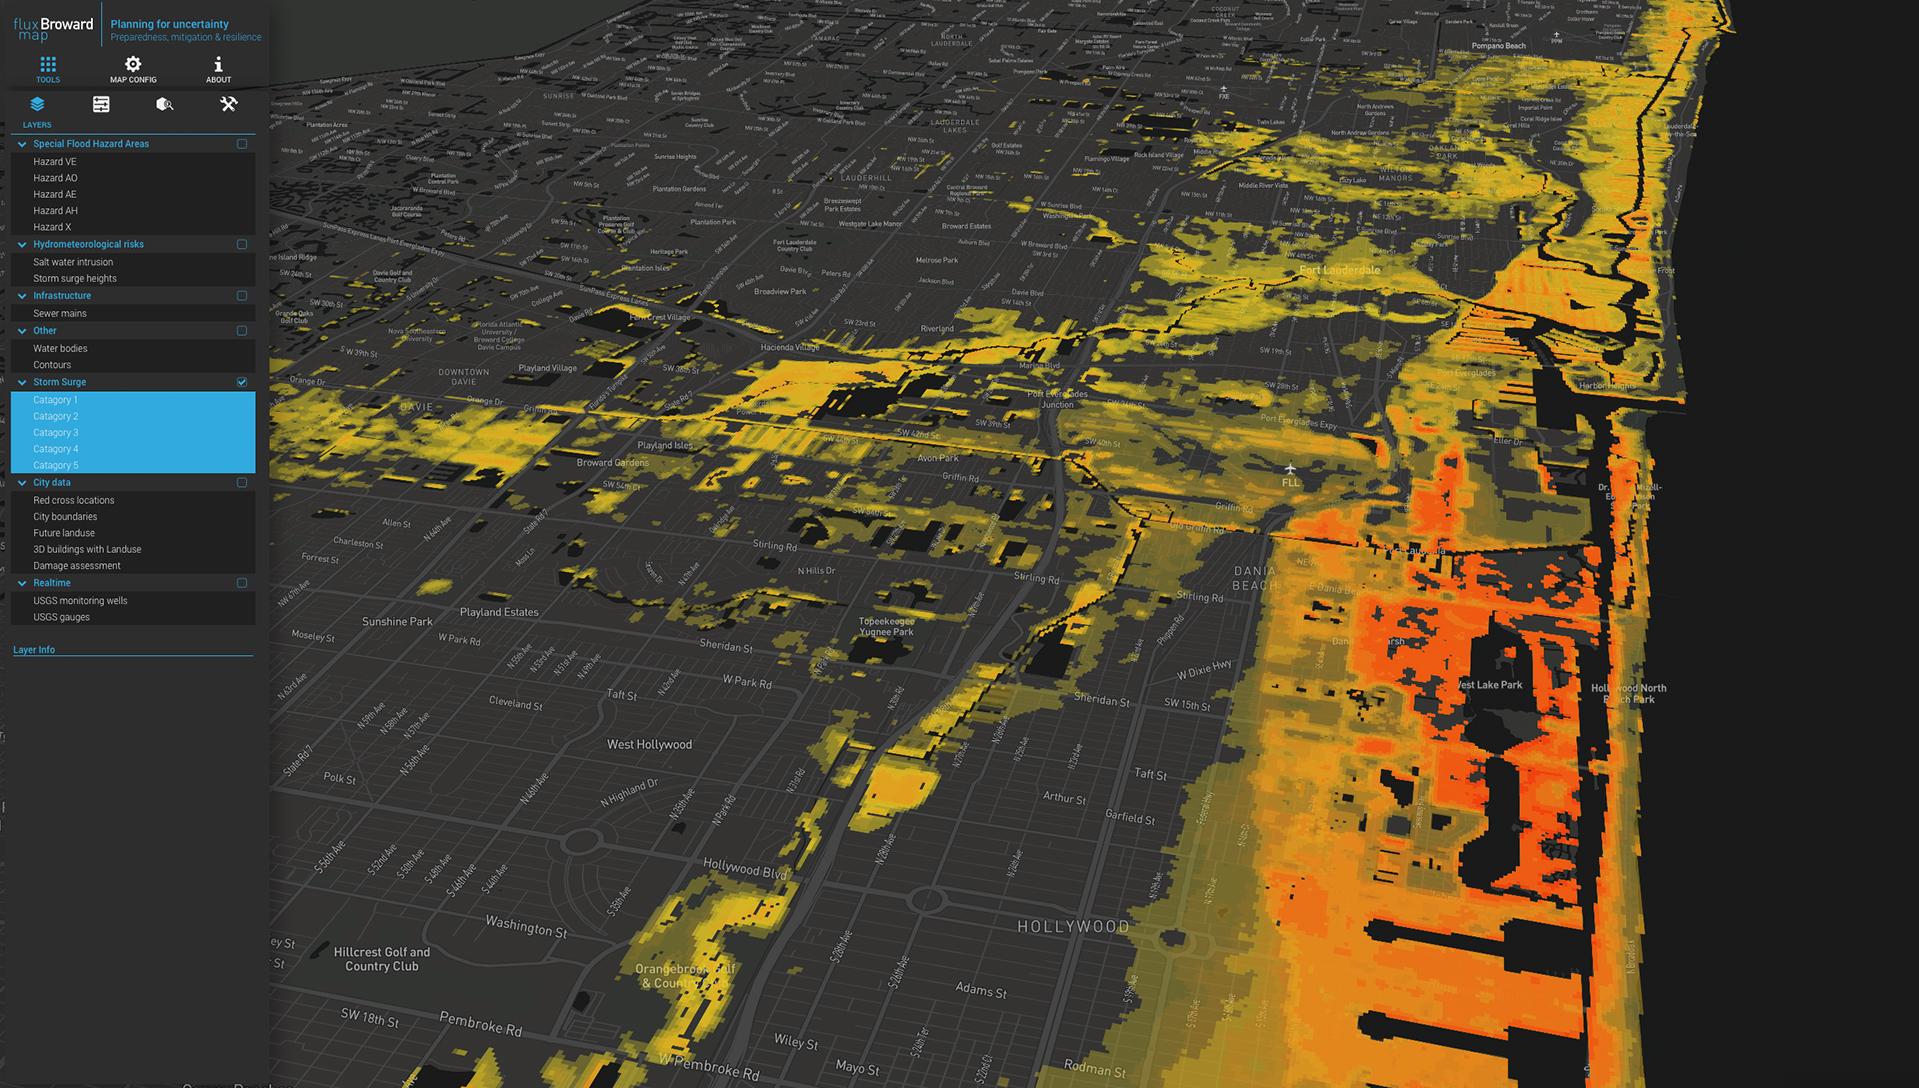 Visualizing storm surge vulnerability